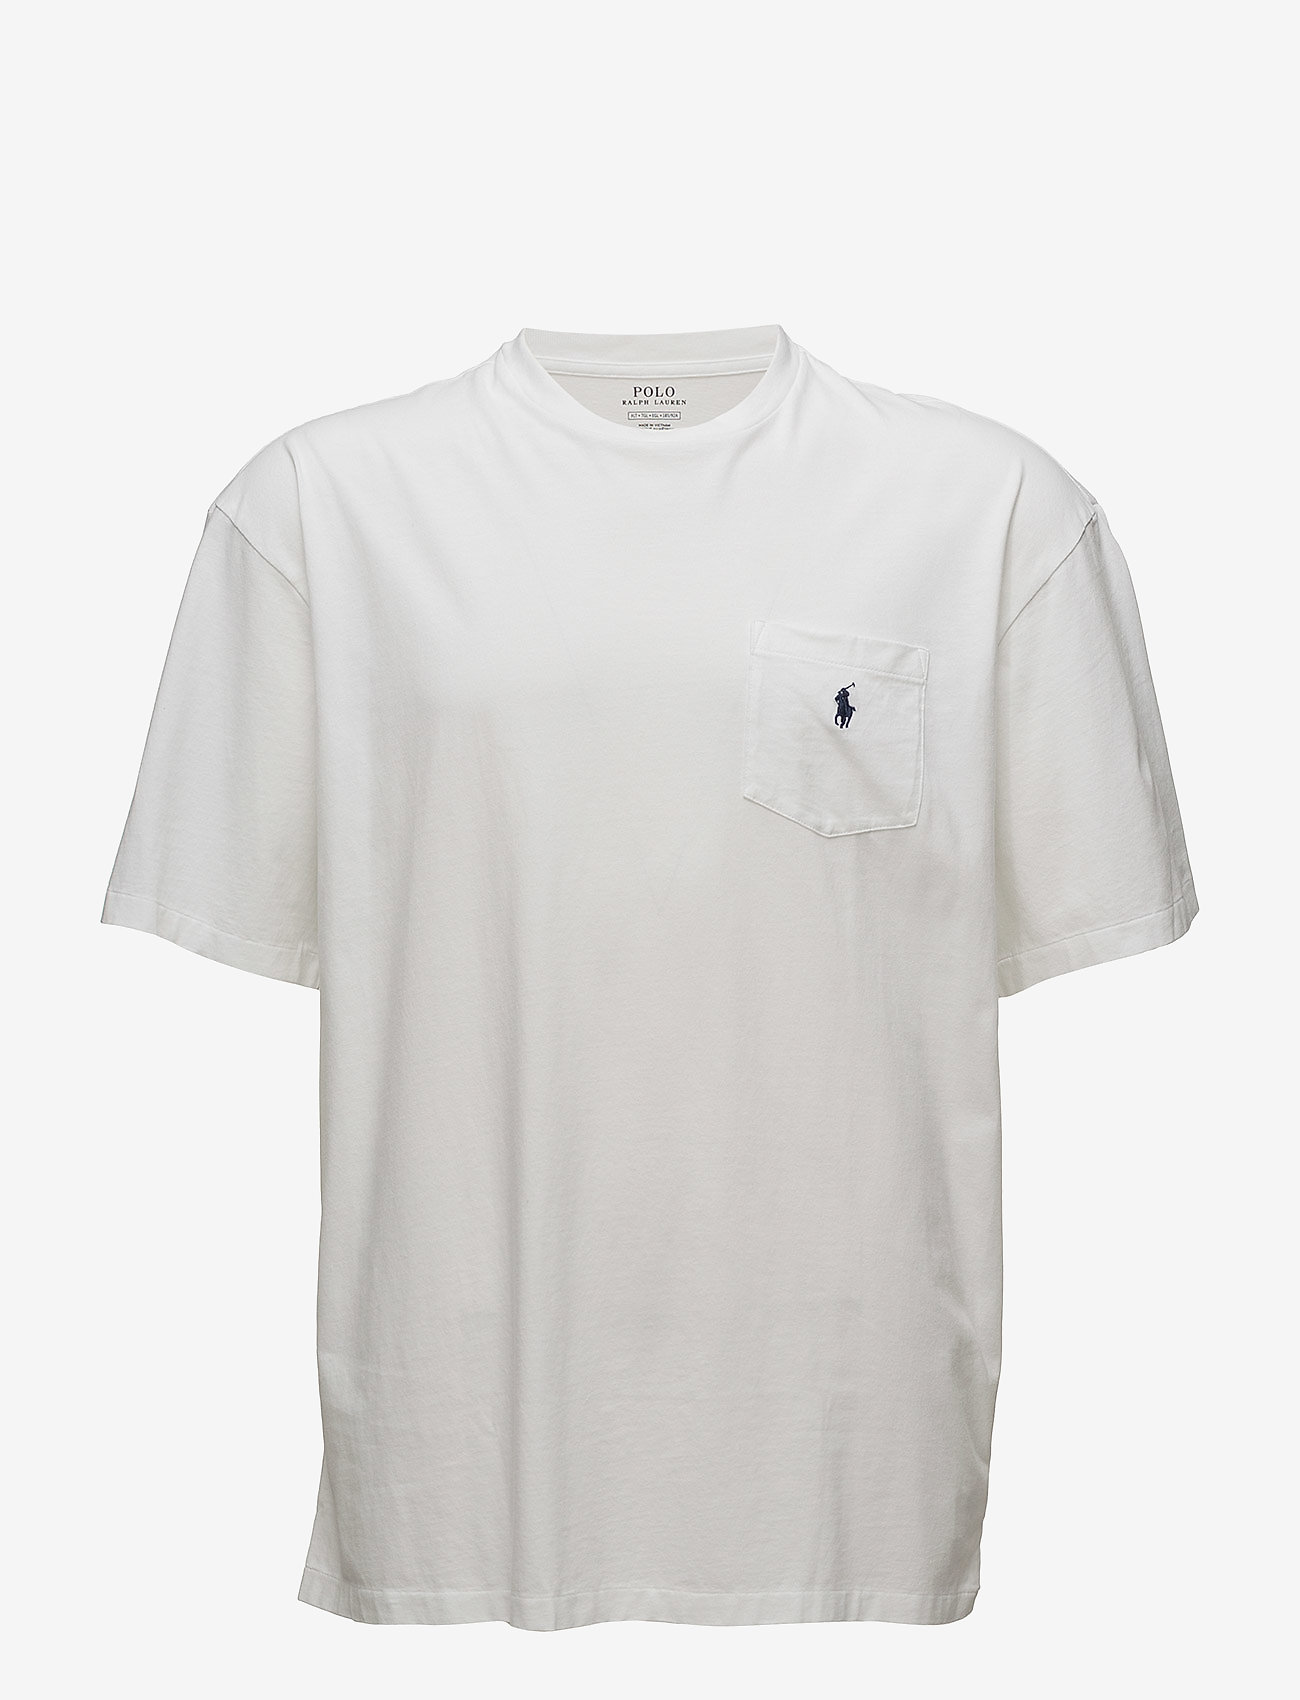 Polo Ralph Lauren Big & Tall - Classic Fit Pocket T-Shirt - kortärmade t-shirts - white - 0